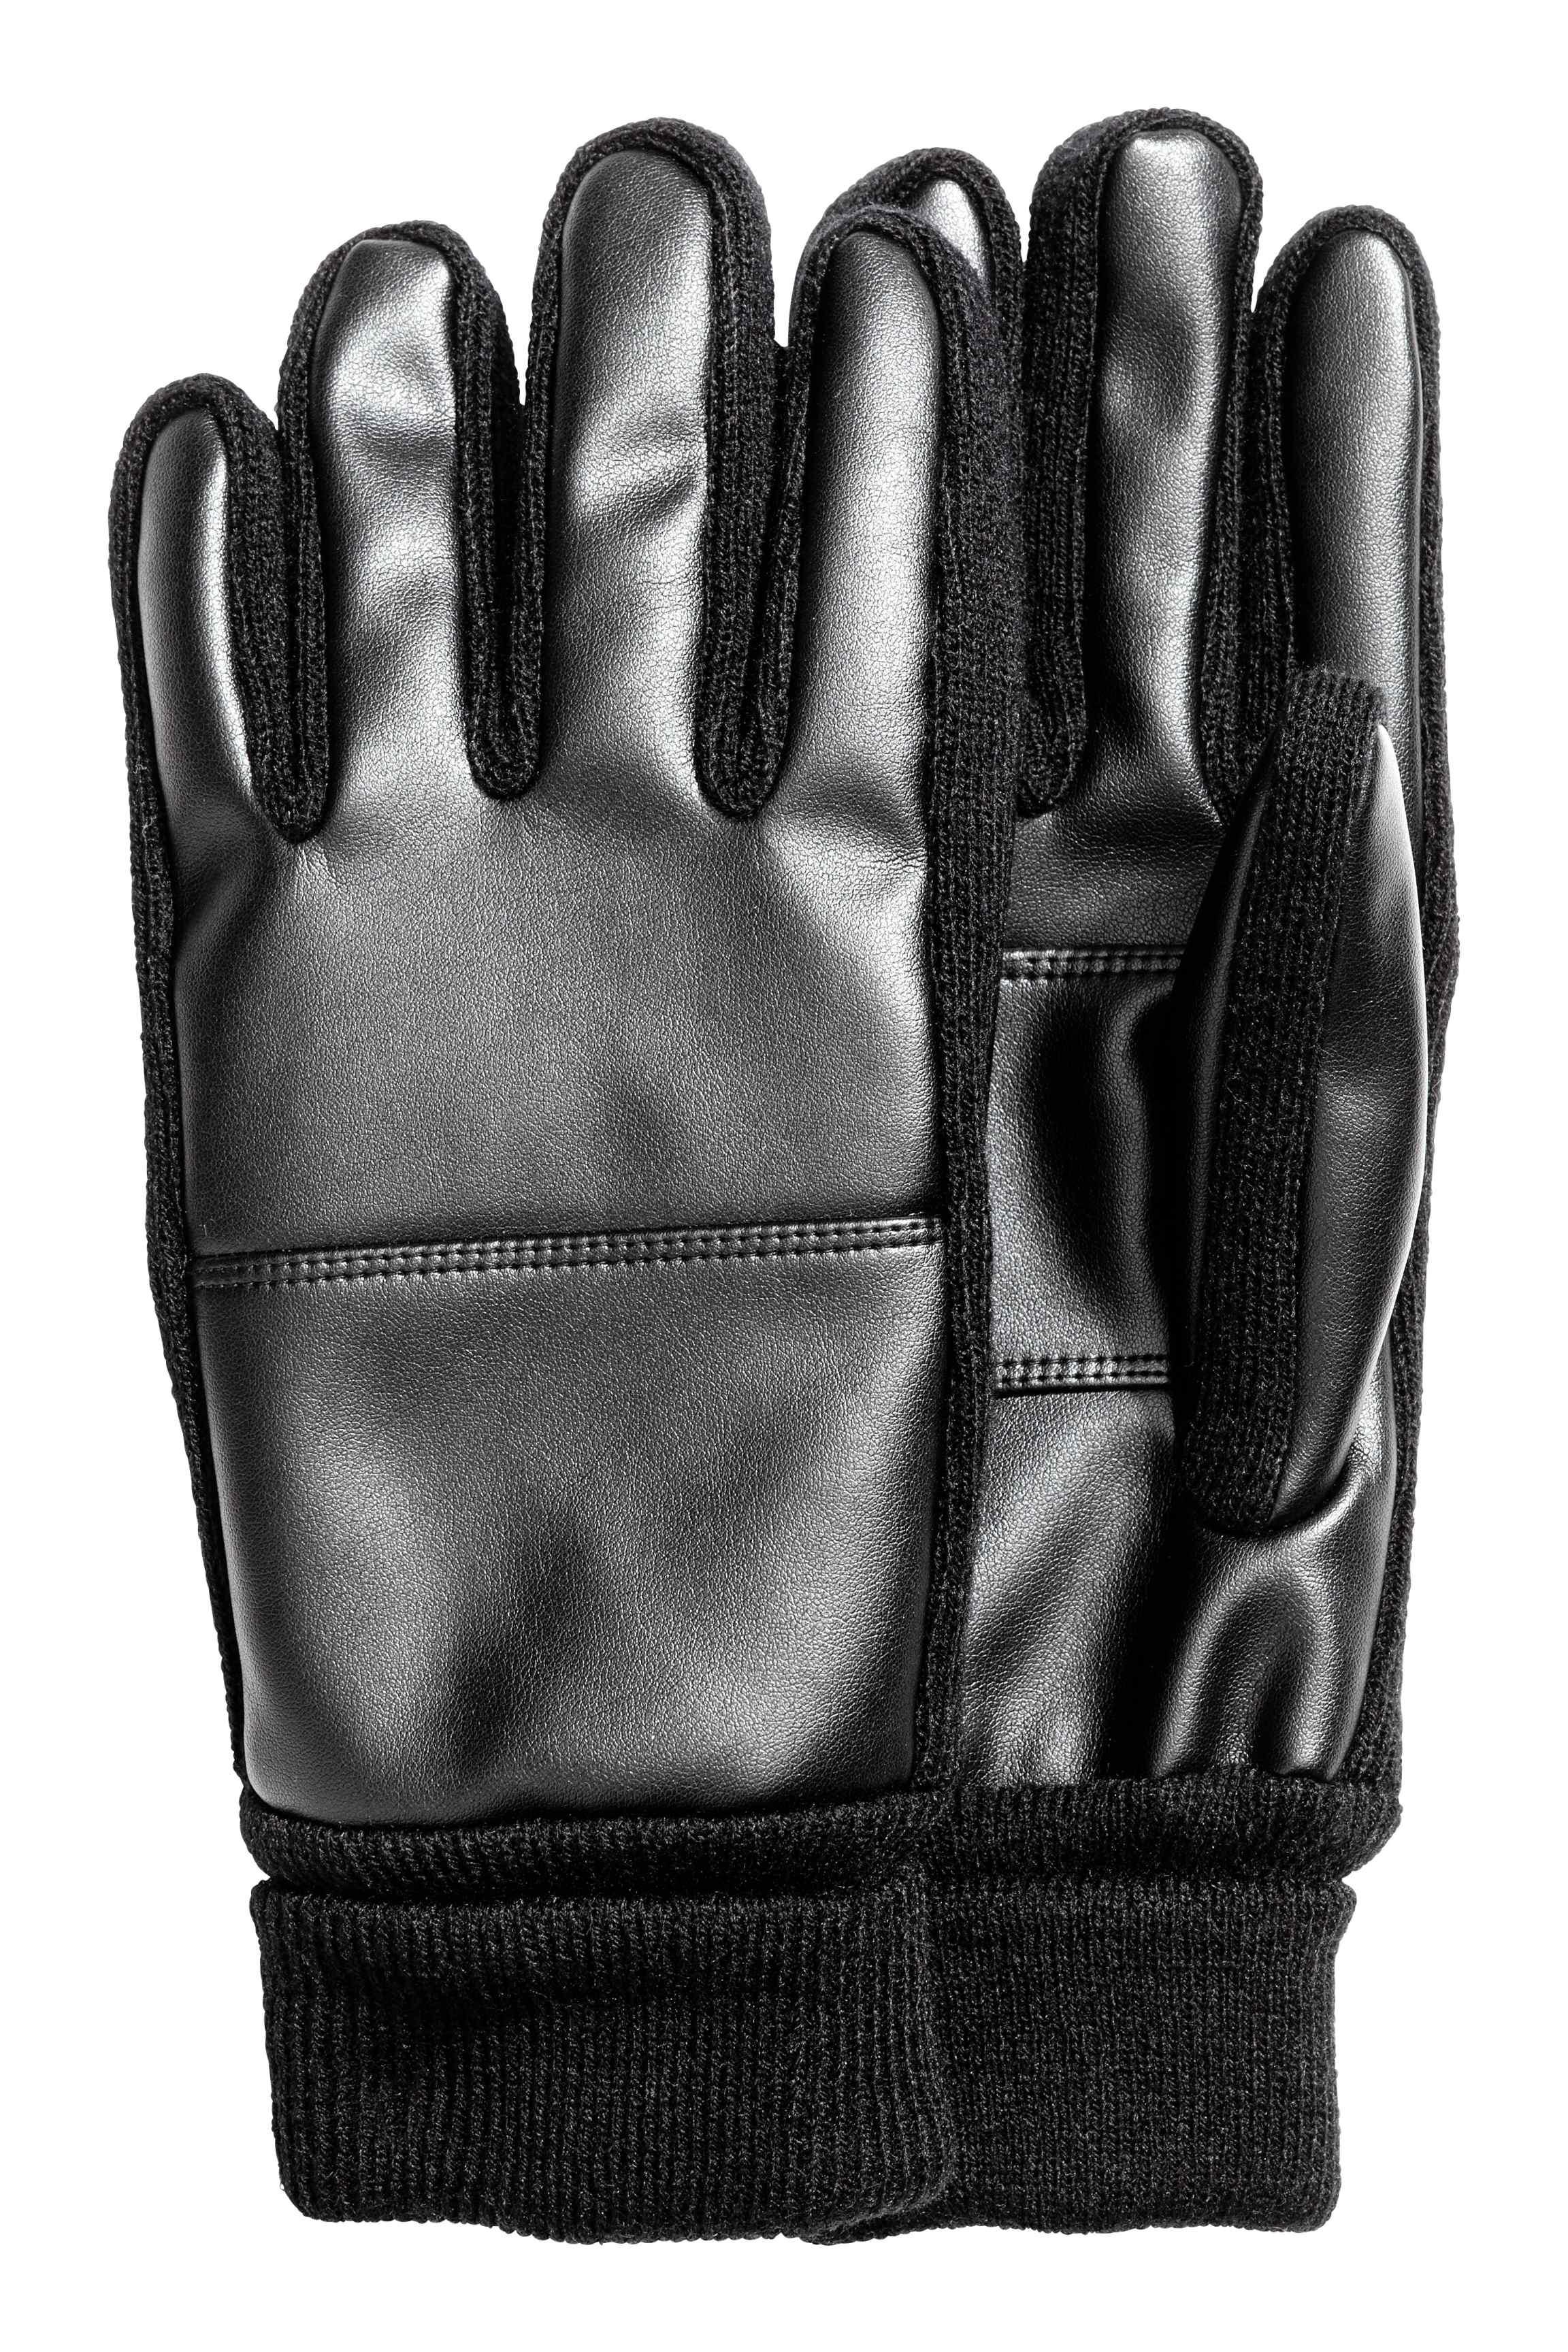 Gloves, £9.99 ( hm.com )